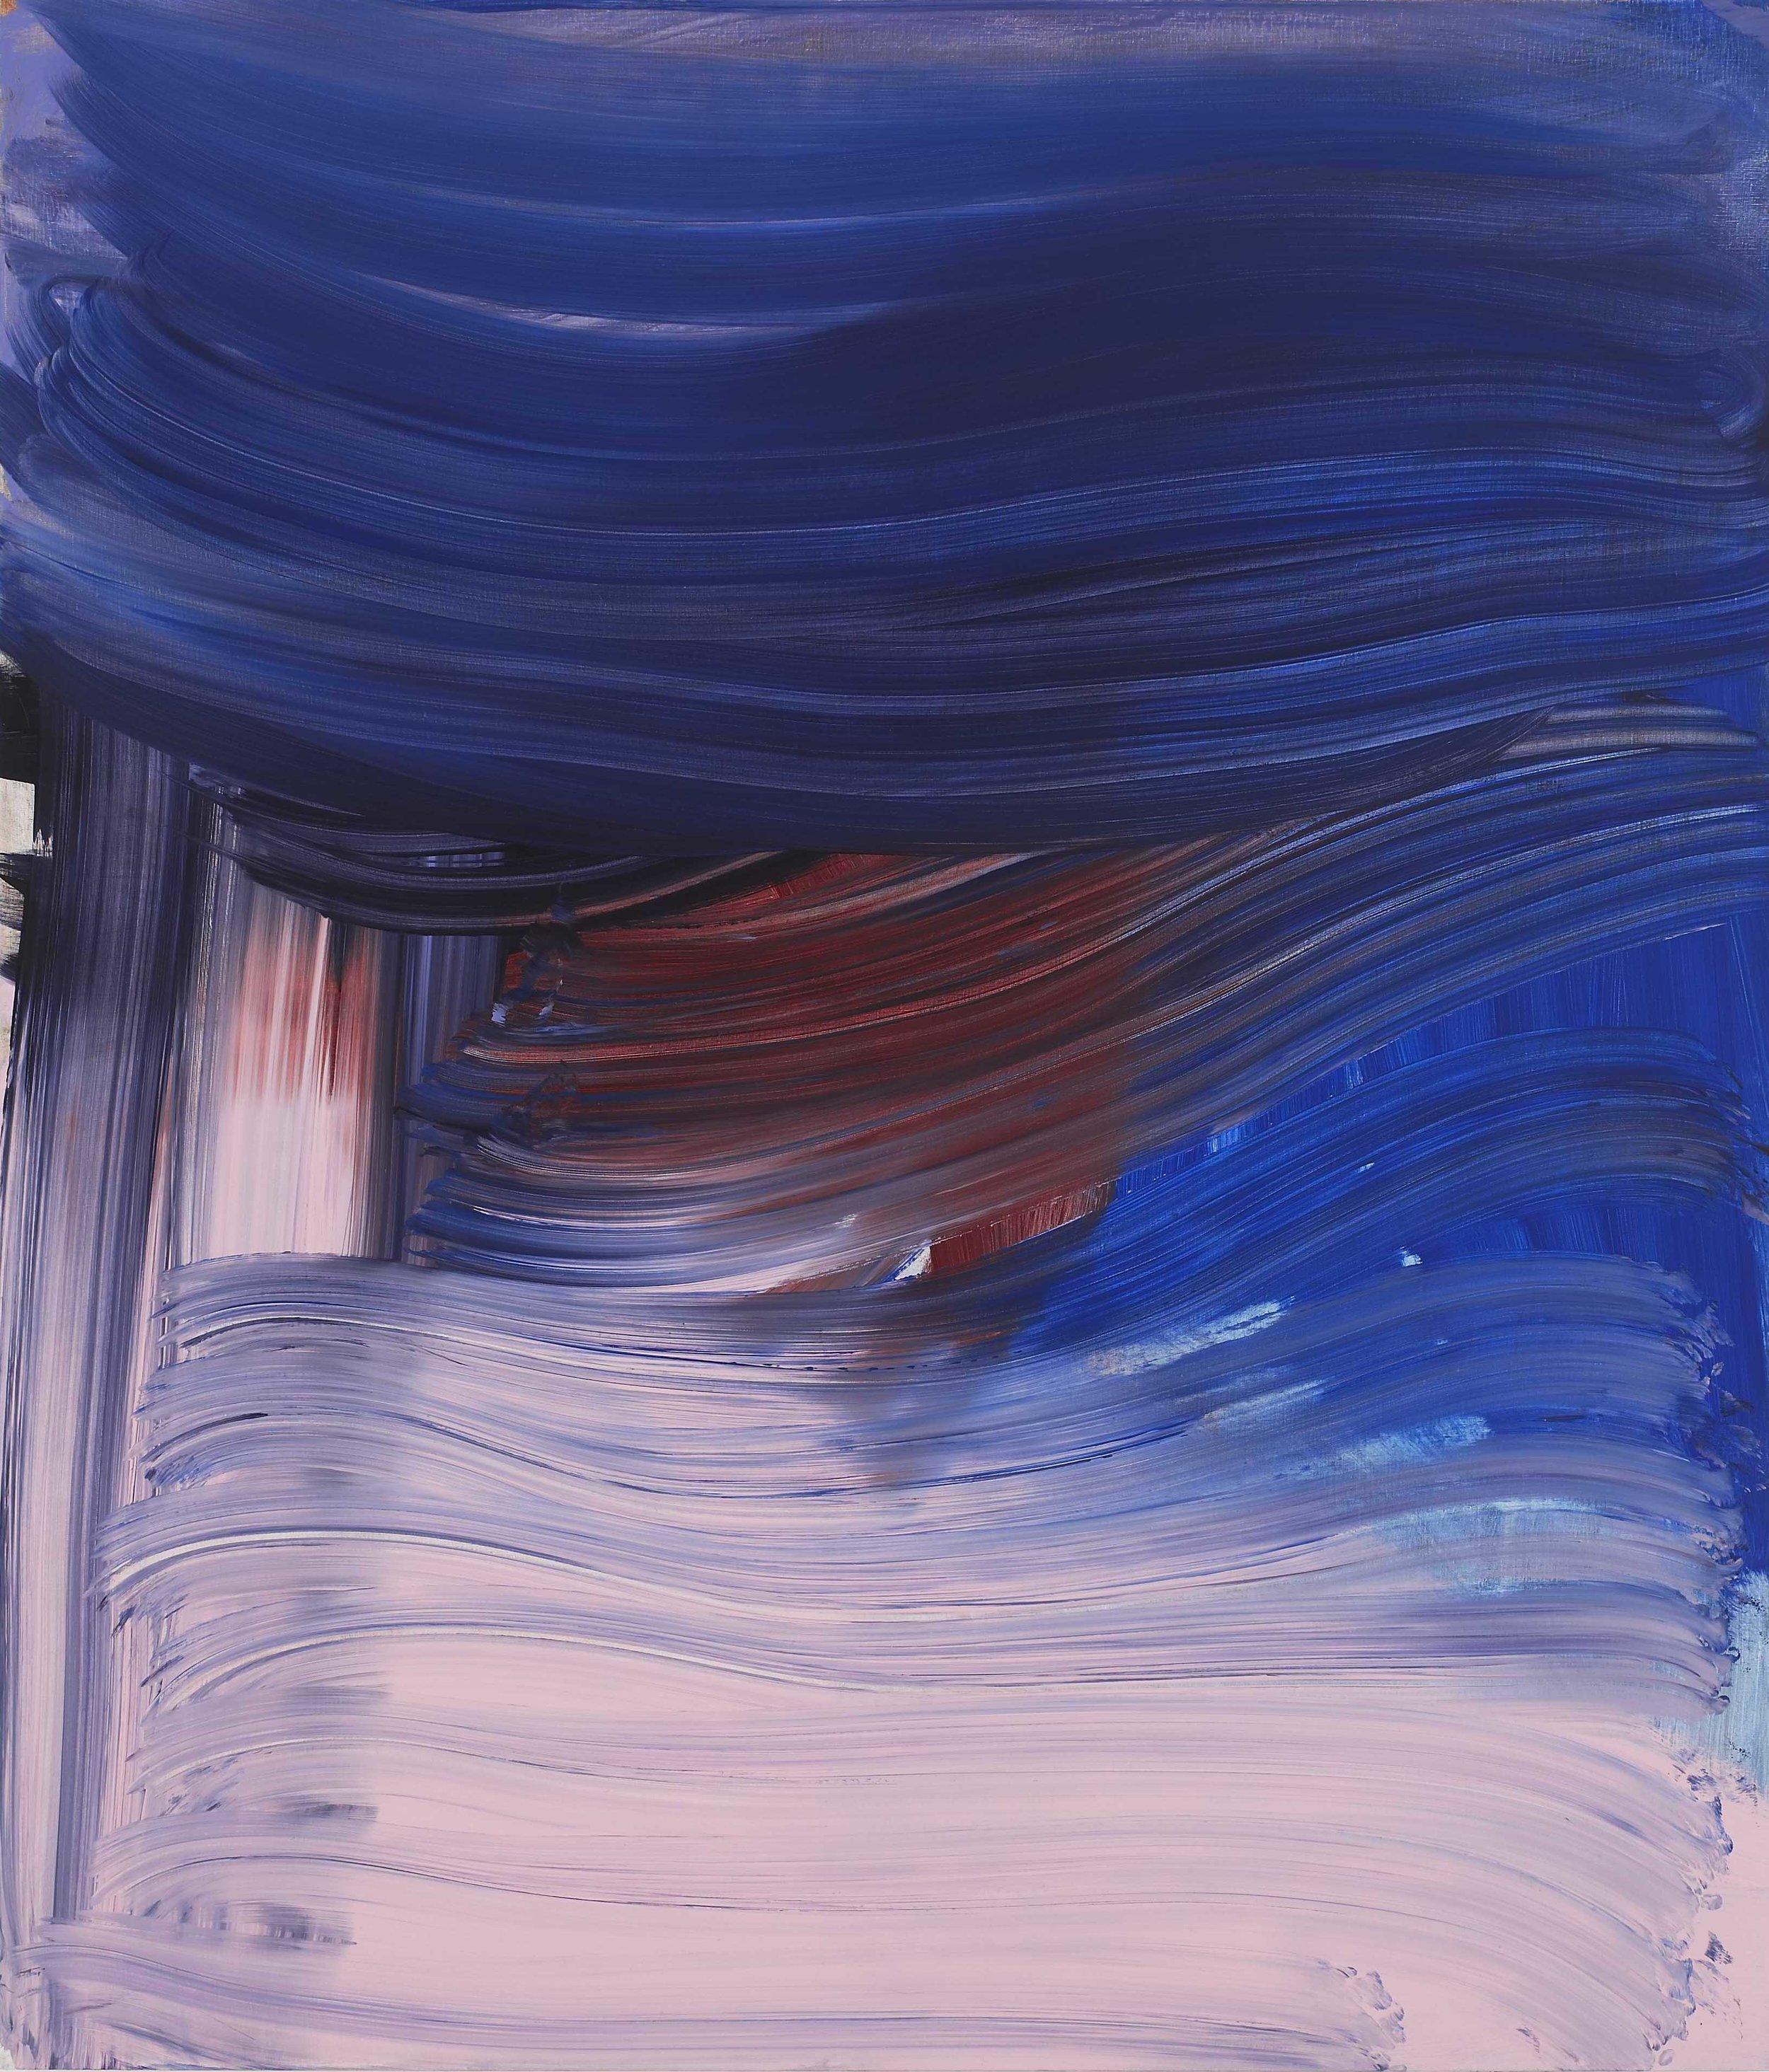 Andrea Belag, Big Blue, 2012, oil on linen, 56h x 48w in.